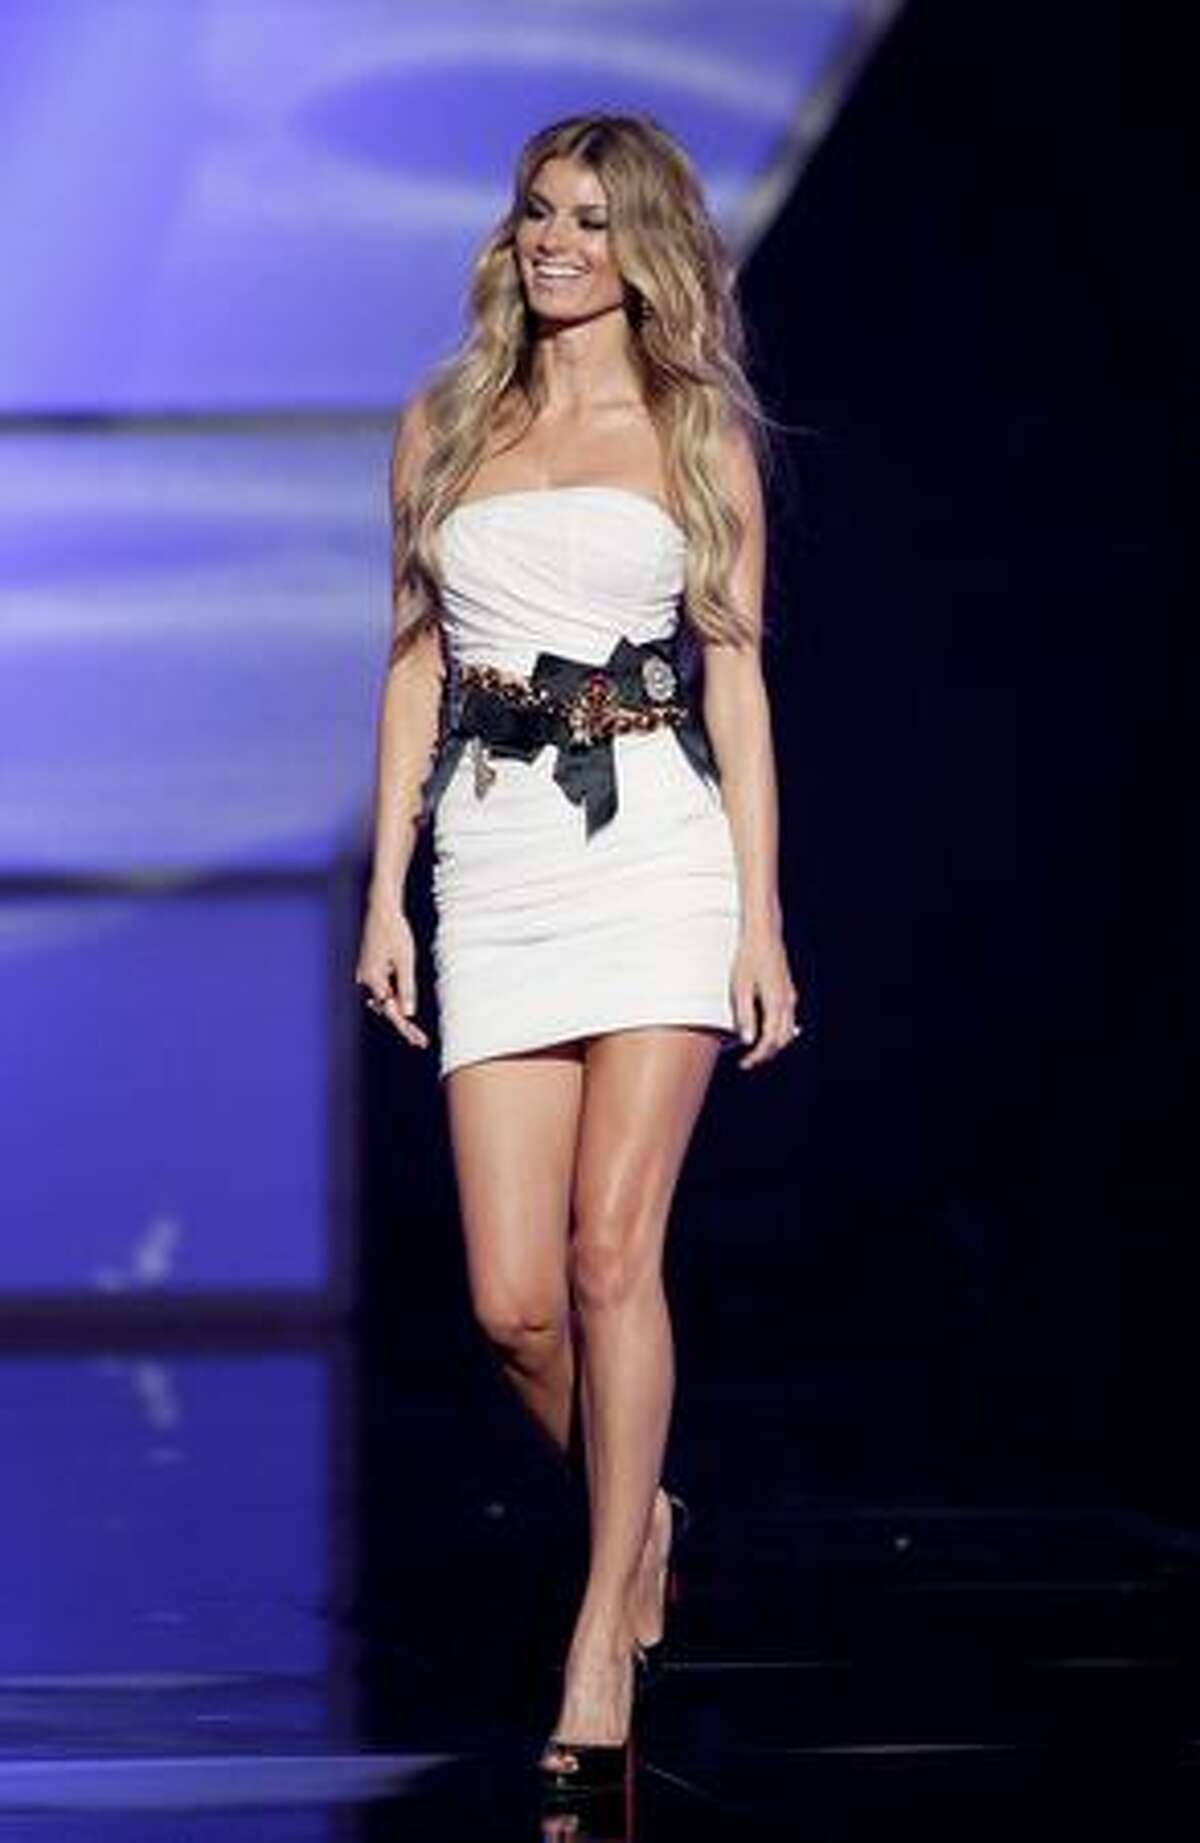 Model Marisa Miller walks onstage.